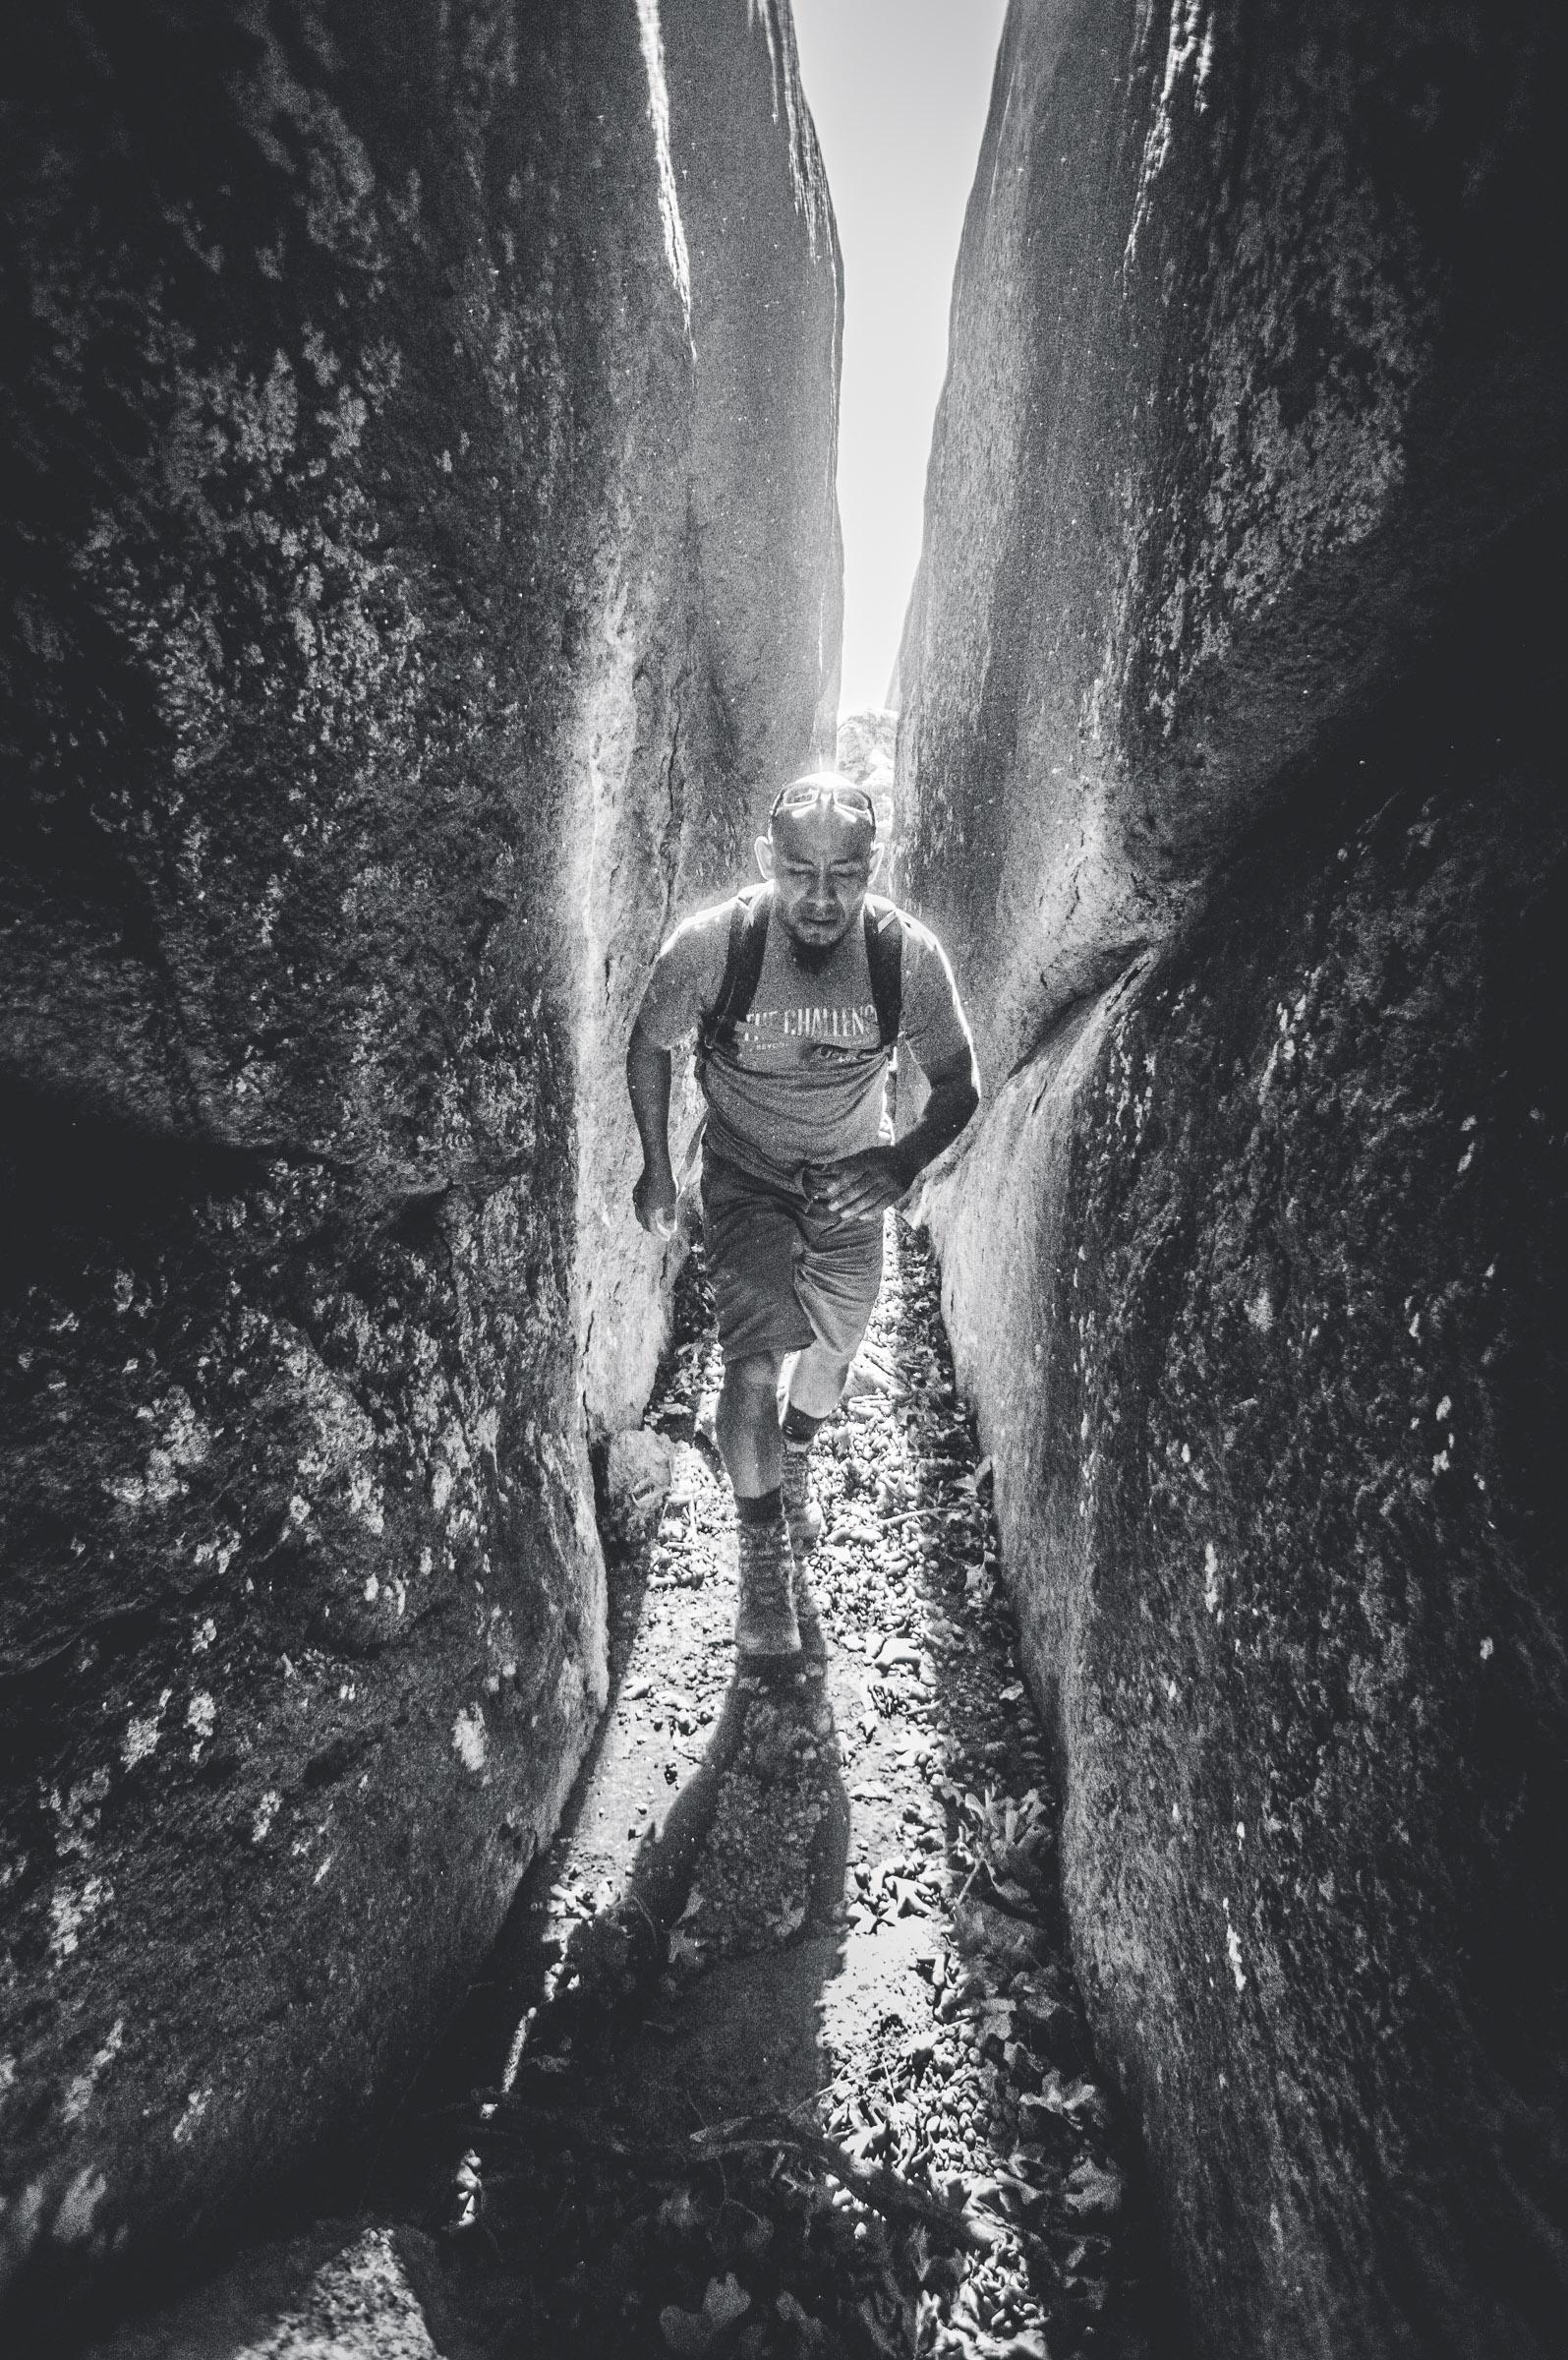 Spanish Cave 11-12-16 B&W (33 of 33).JPG